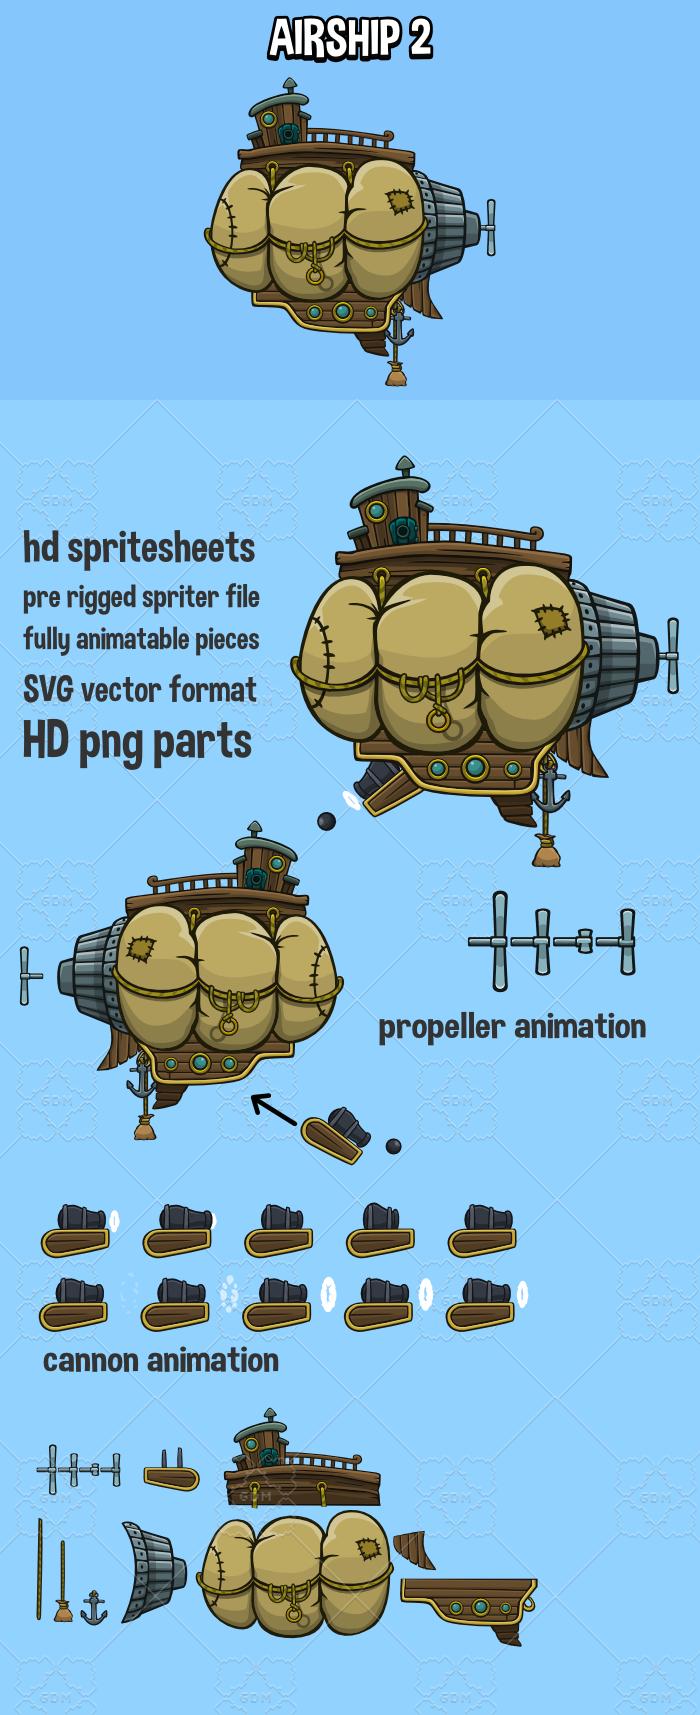 Animated airship 2